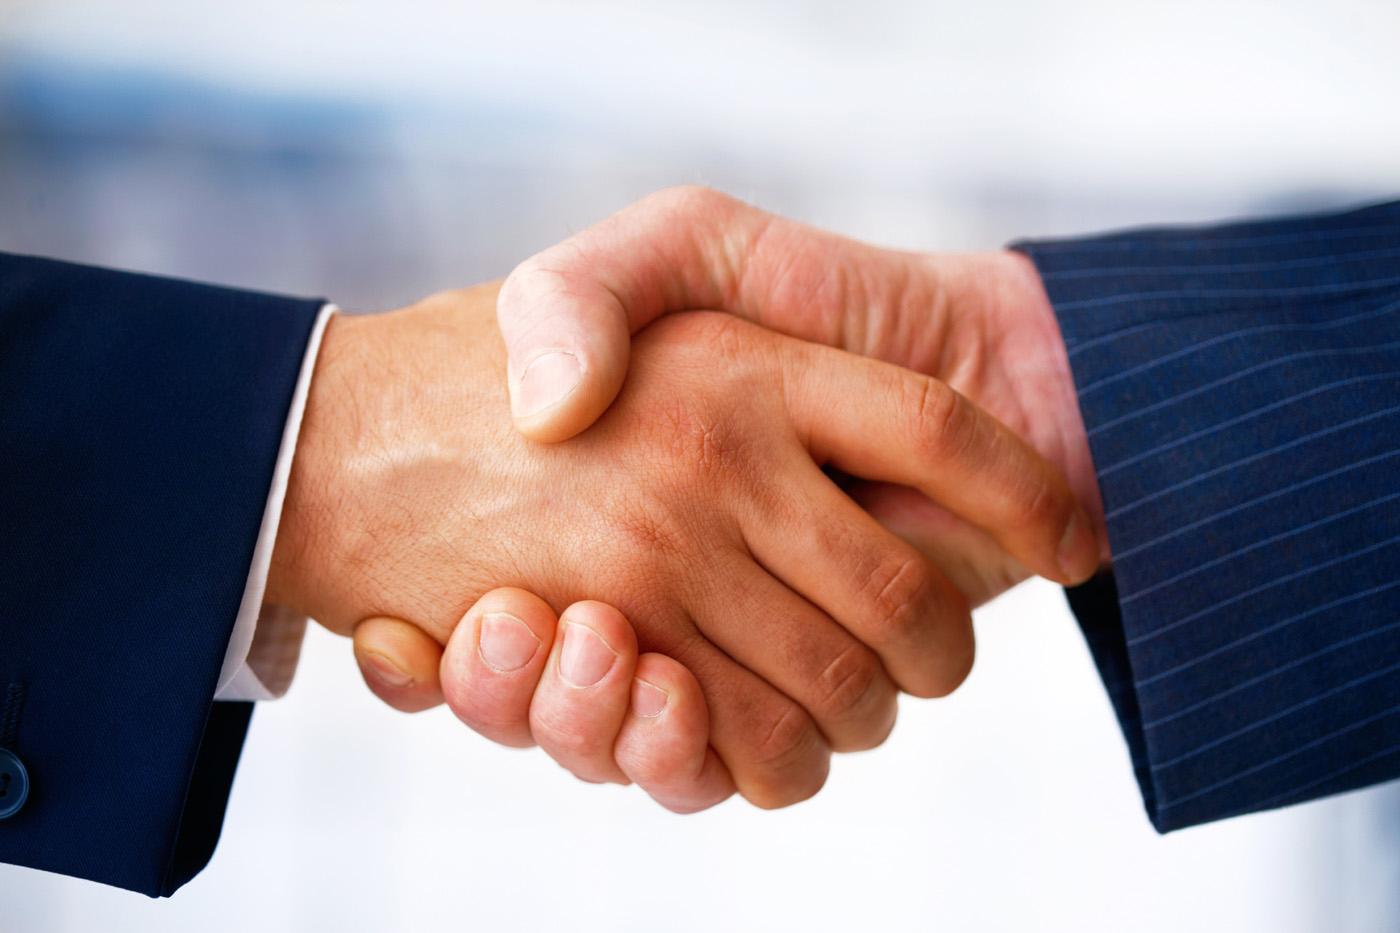 http://jayminspeaks.com/wp-content/uploads/2013/05/26297-cooperation-handshake1.jpg